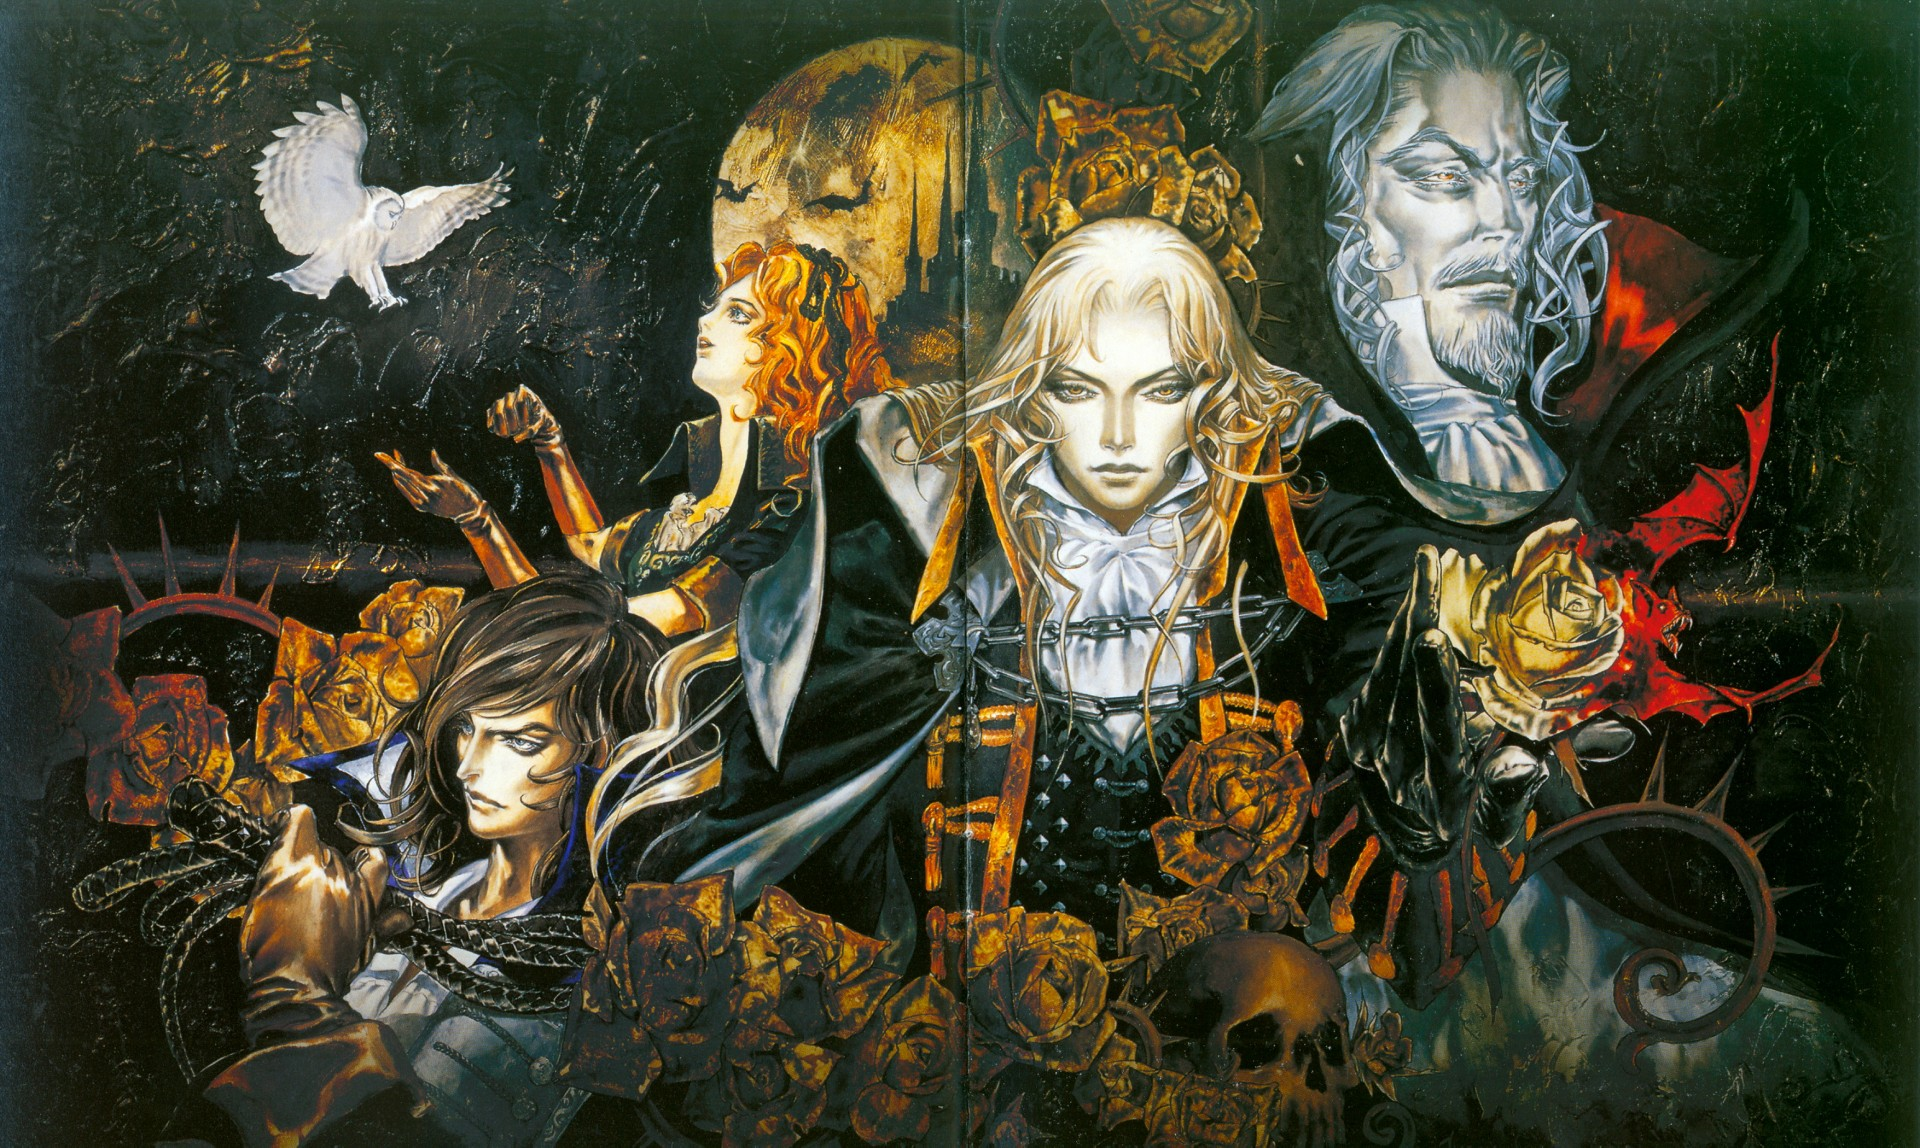 Inside и Castlevania: Symphony of the Night возглавили Xbox Live Gold в июле